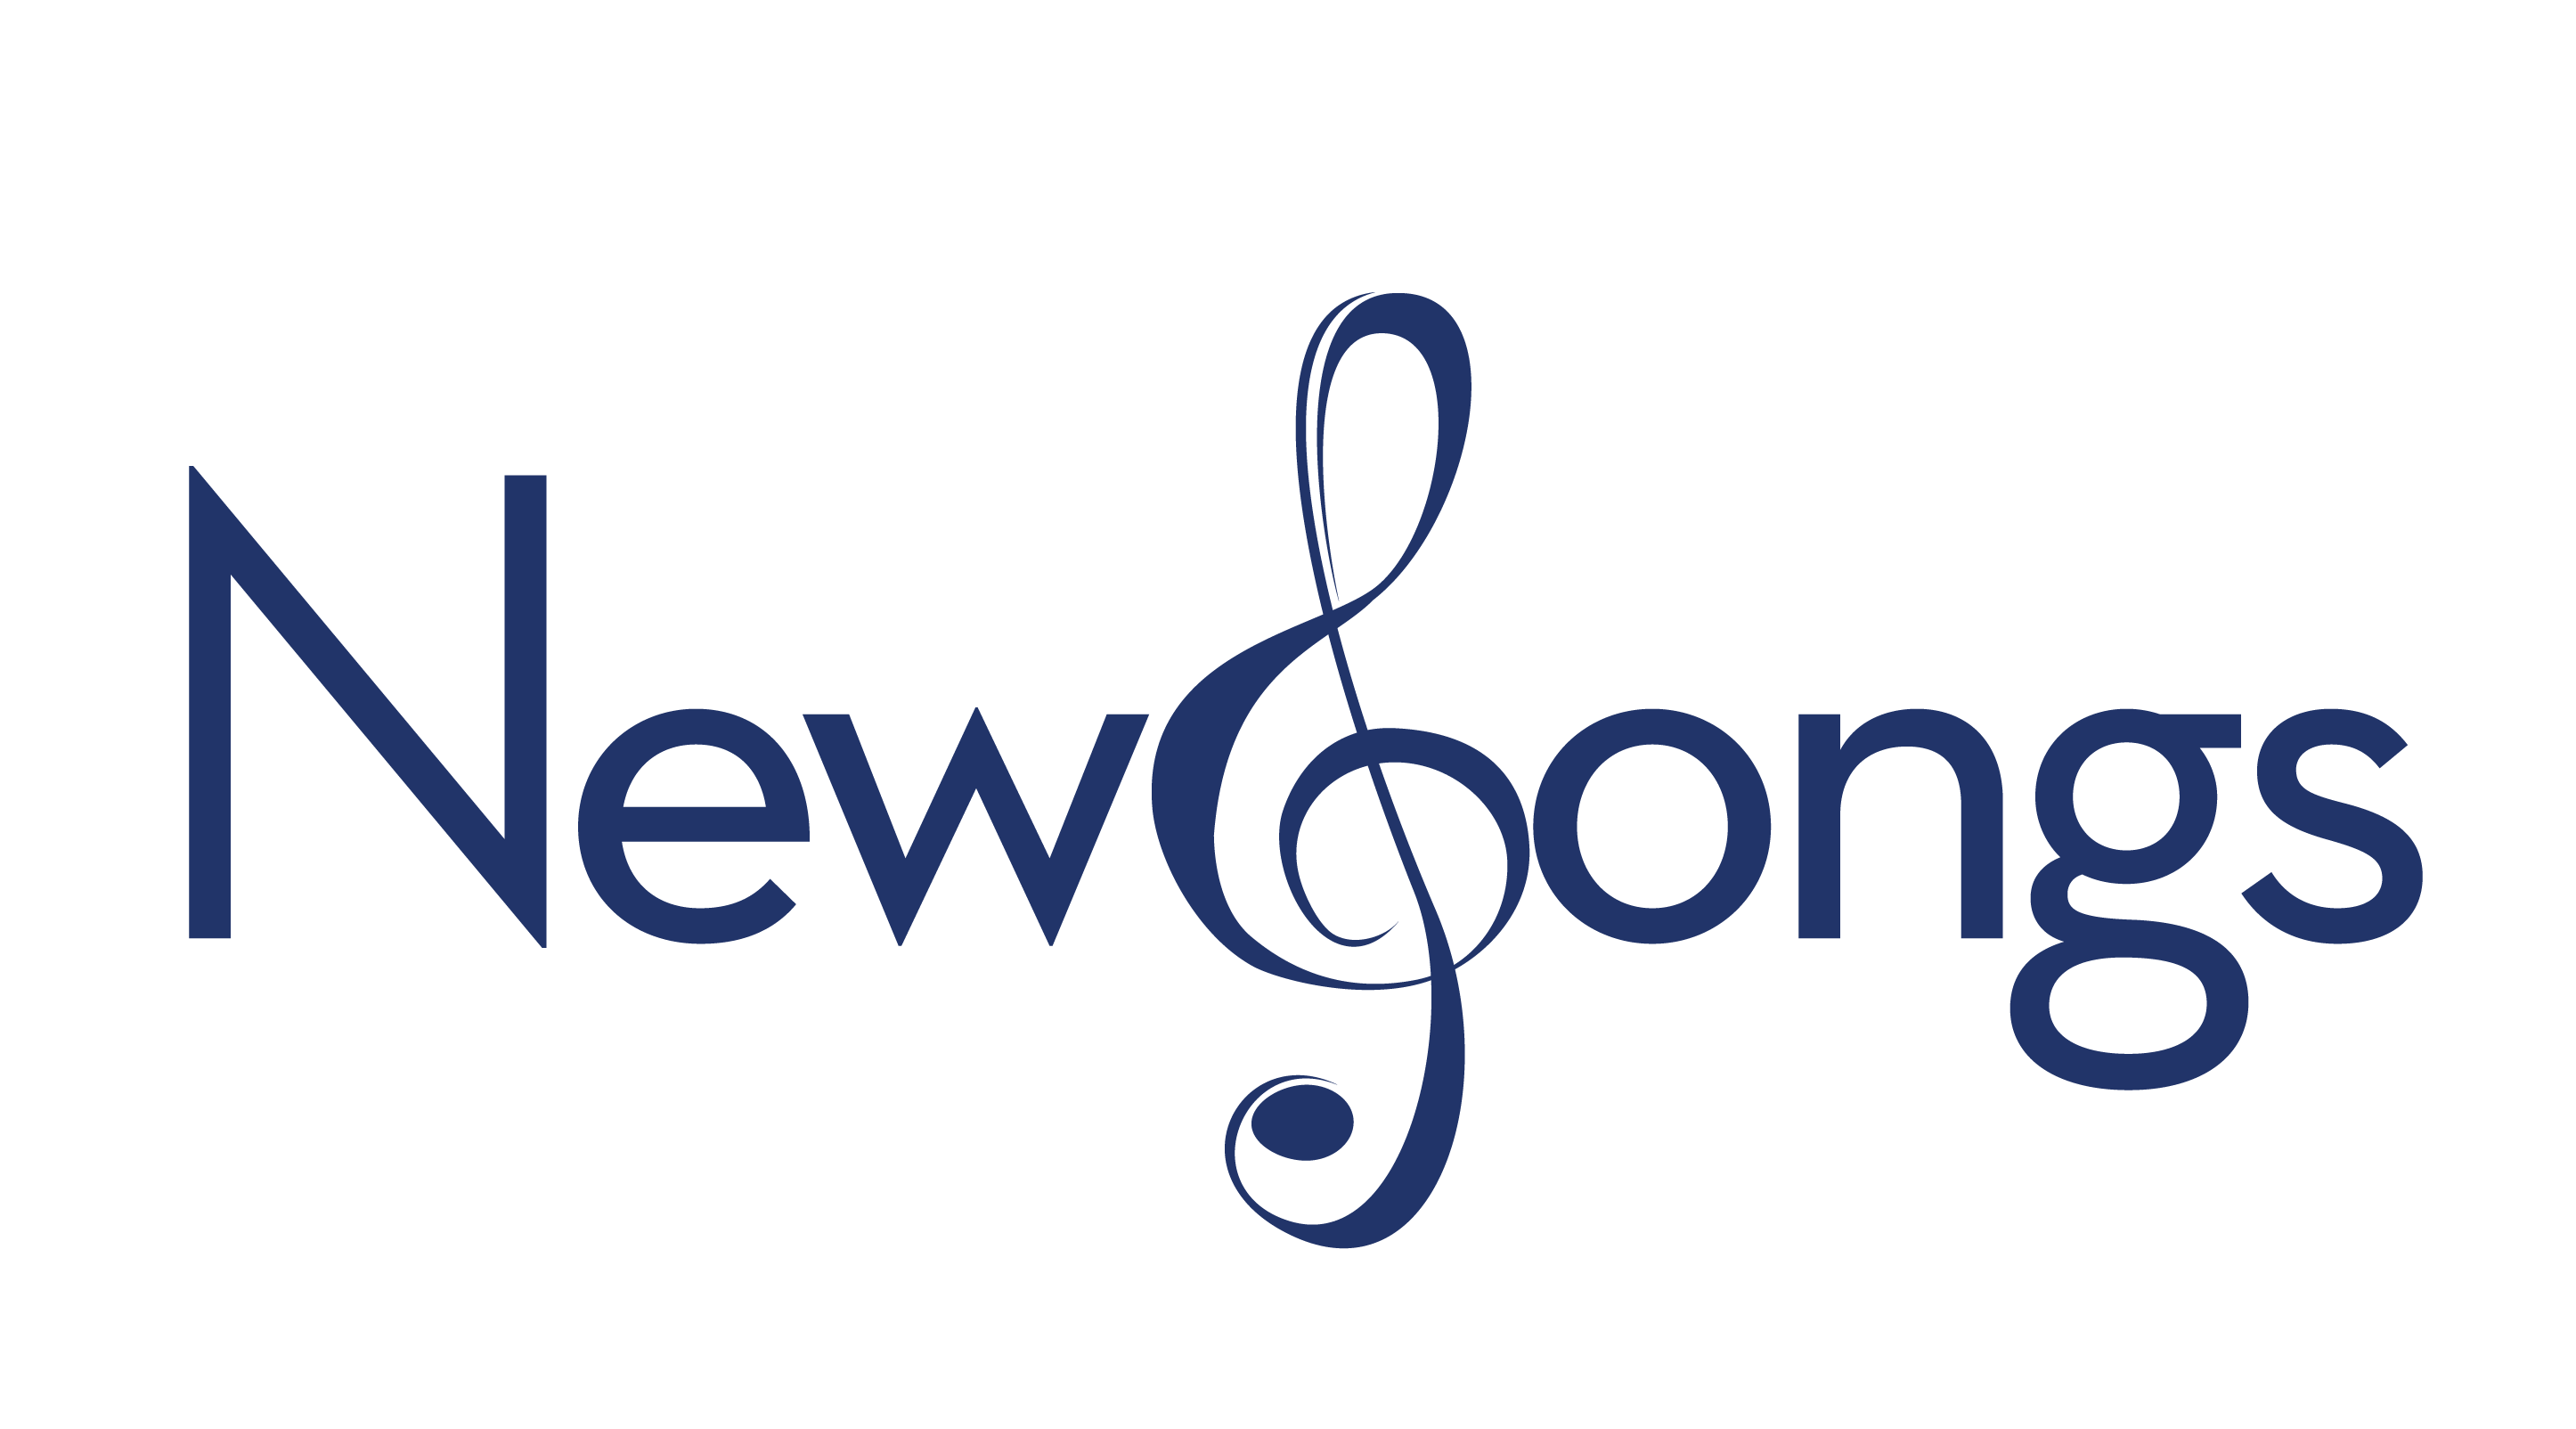 NewSongs School of Music logo